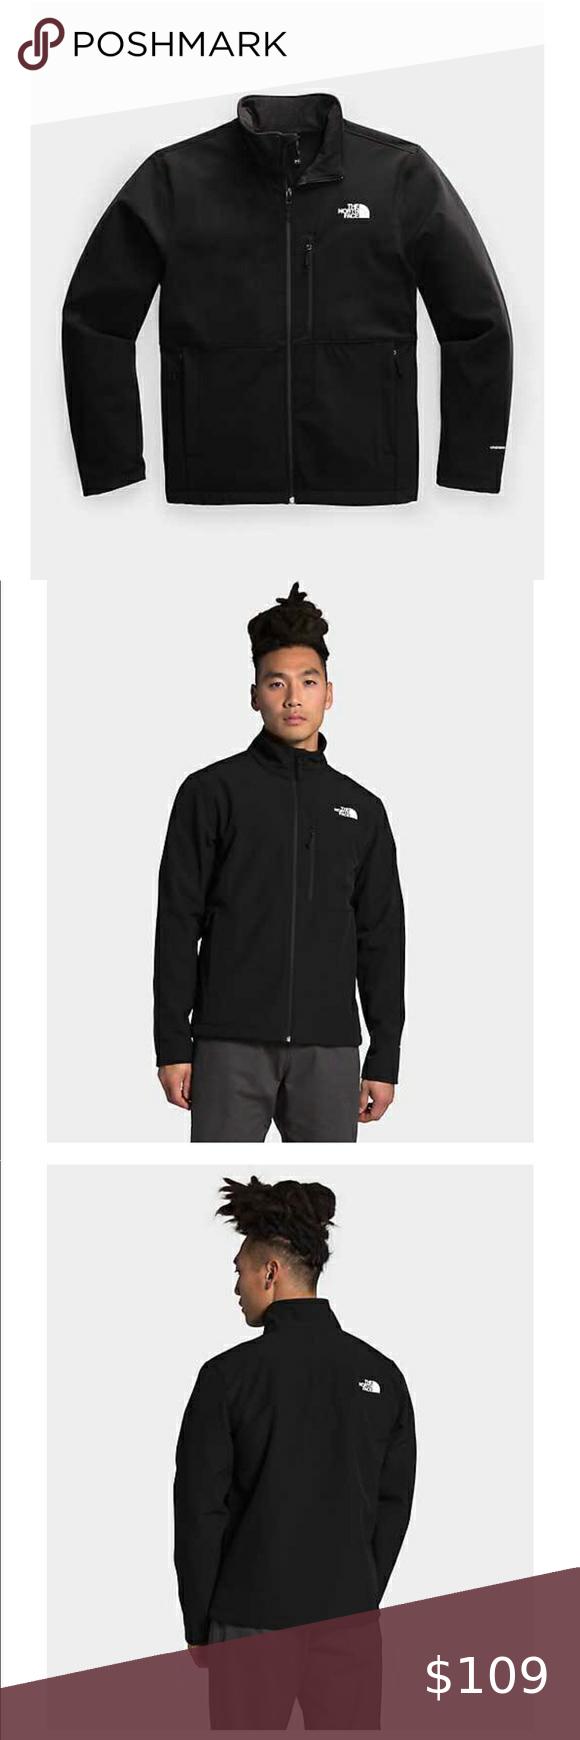 4x Hp Men S Xl North Face Apex Bionic Jacket Clothes Design Black North Face Jackets [ 1740 x 580 Pixel ]